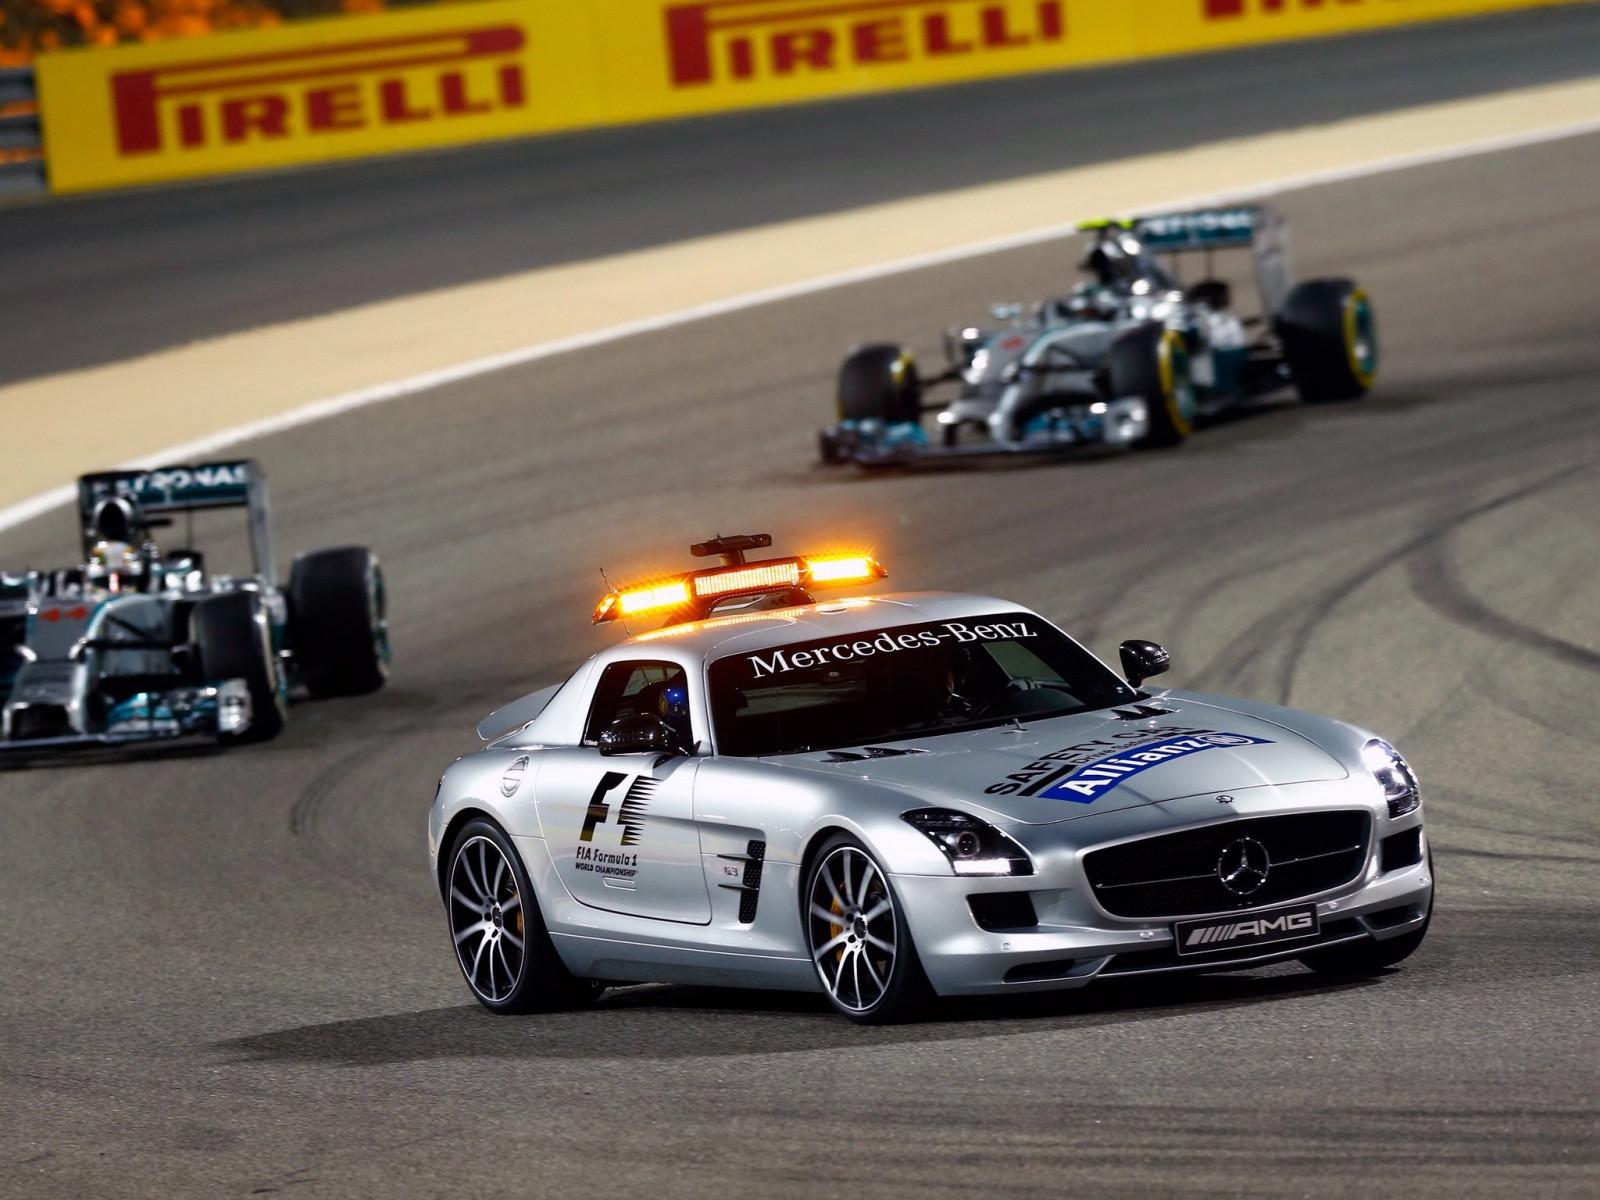 Wallpaper Lights Depth Of Field Supercars Mercedes